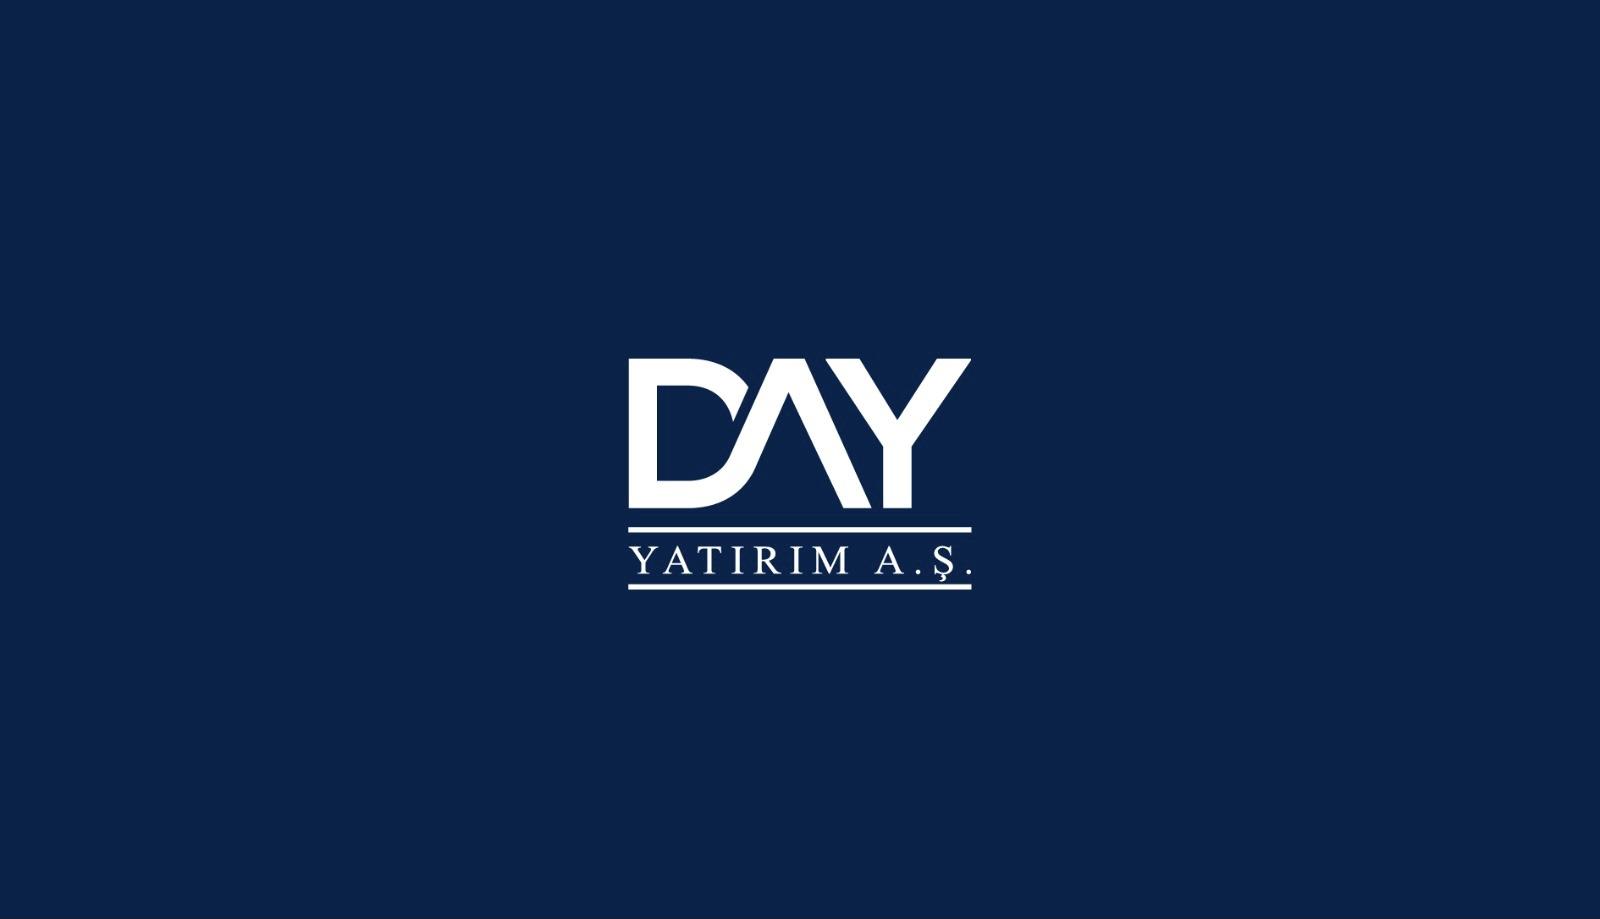 DAY YATIRIM A.Ş